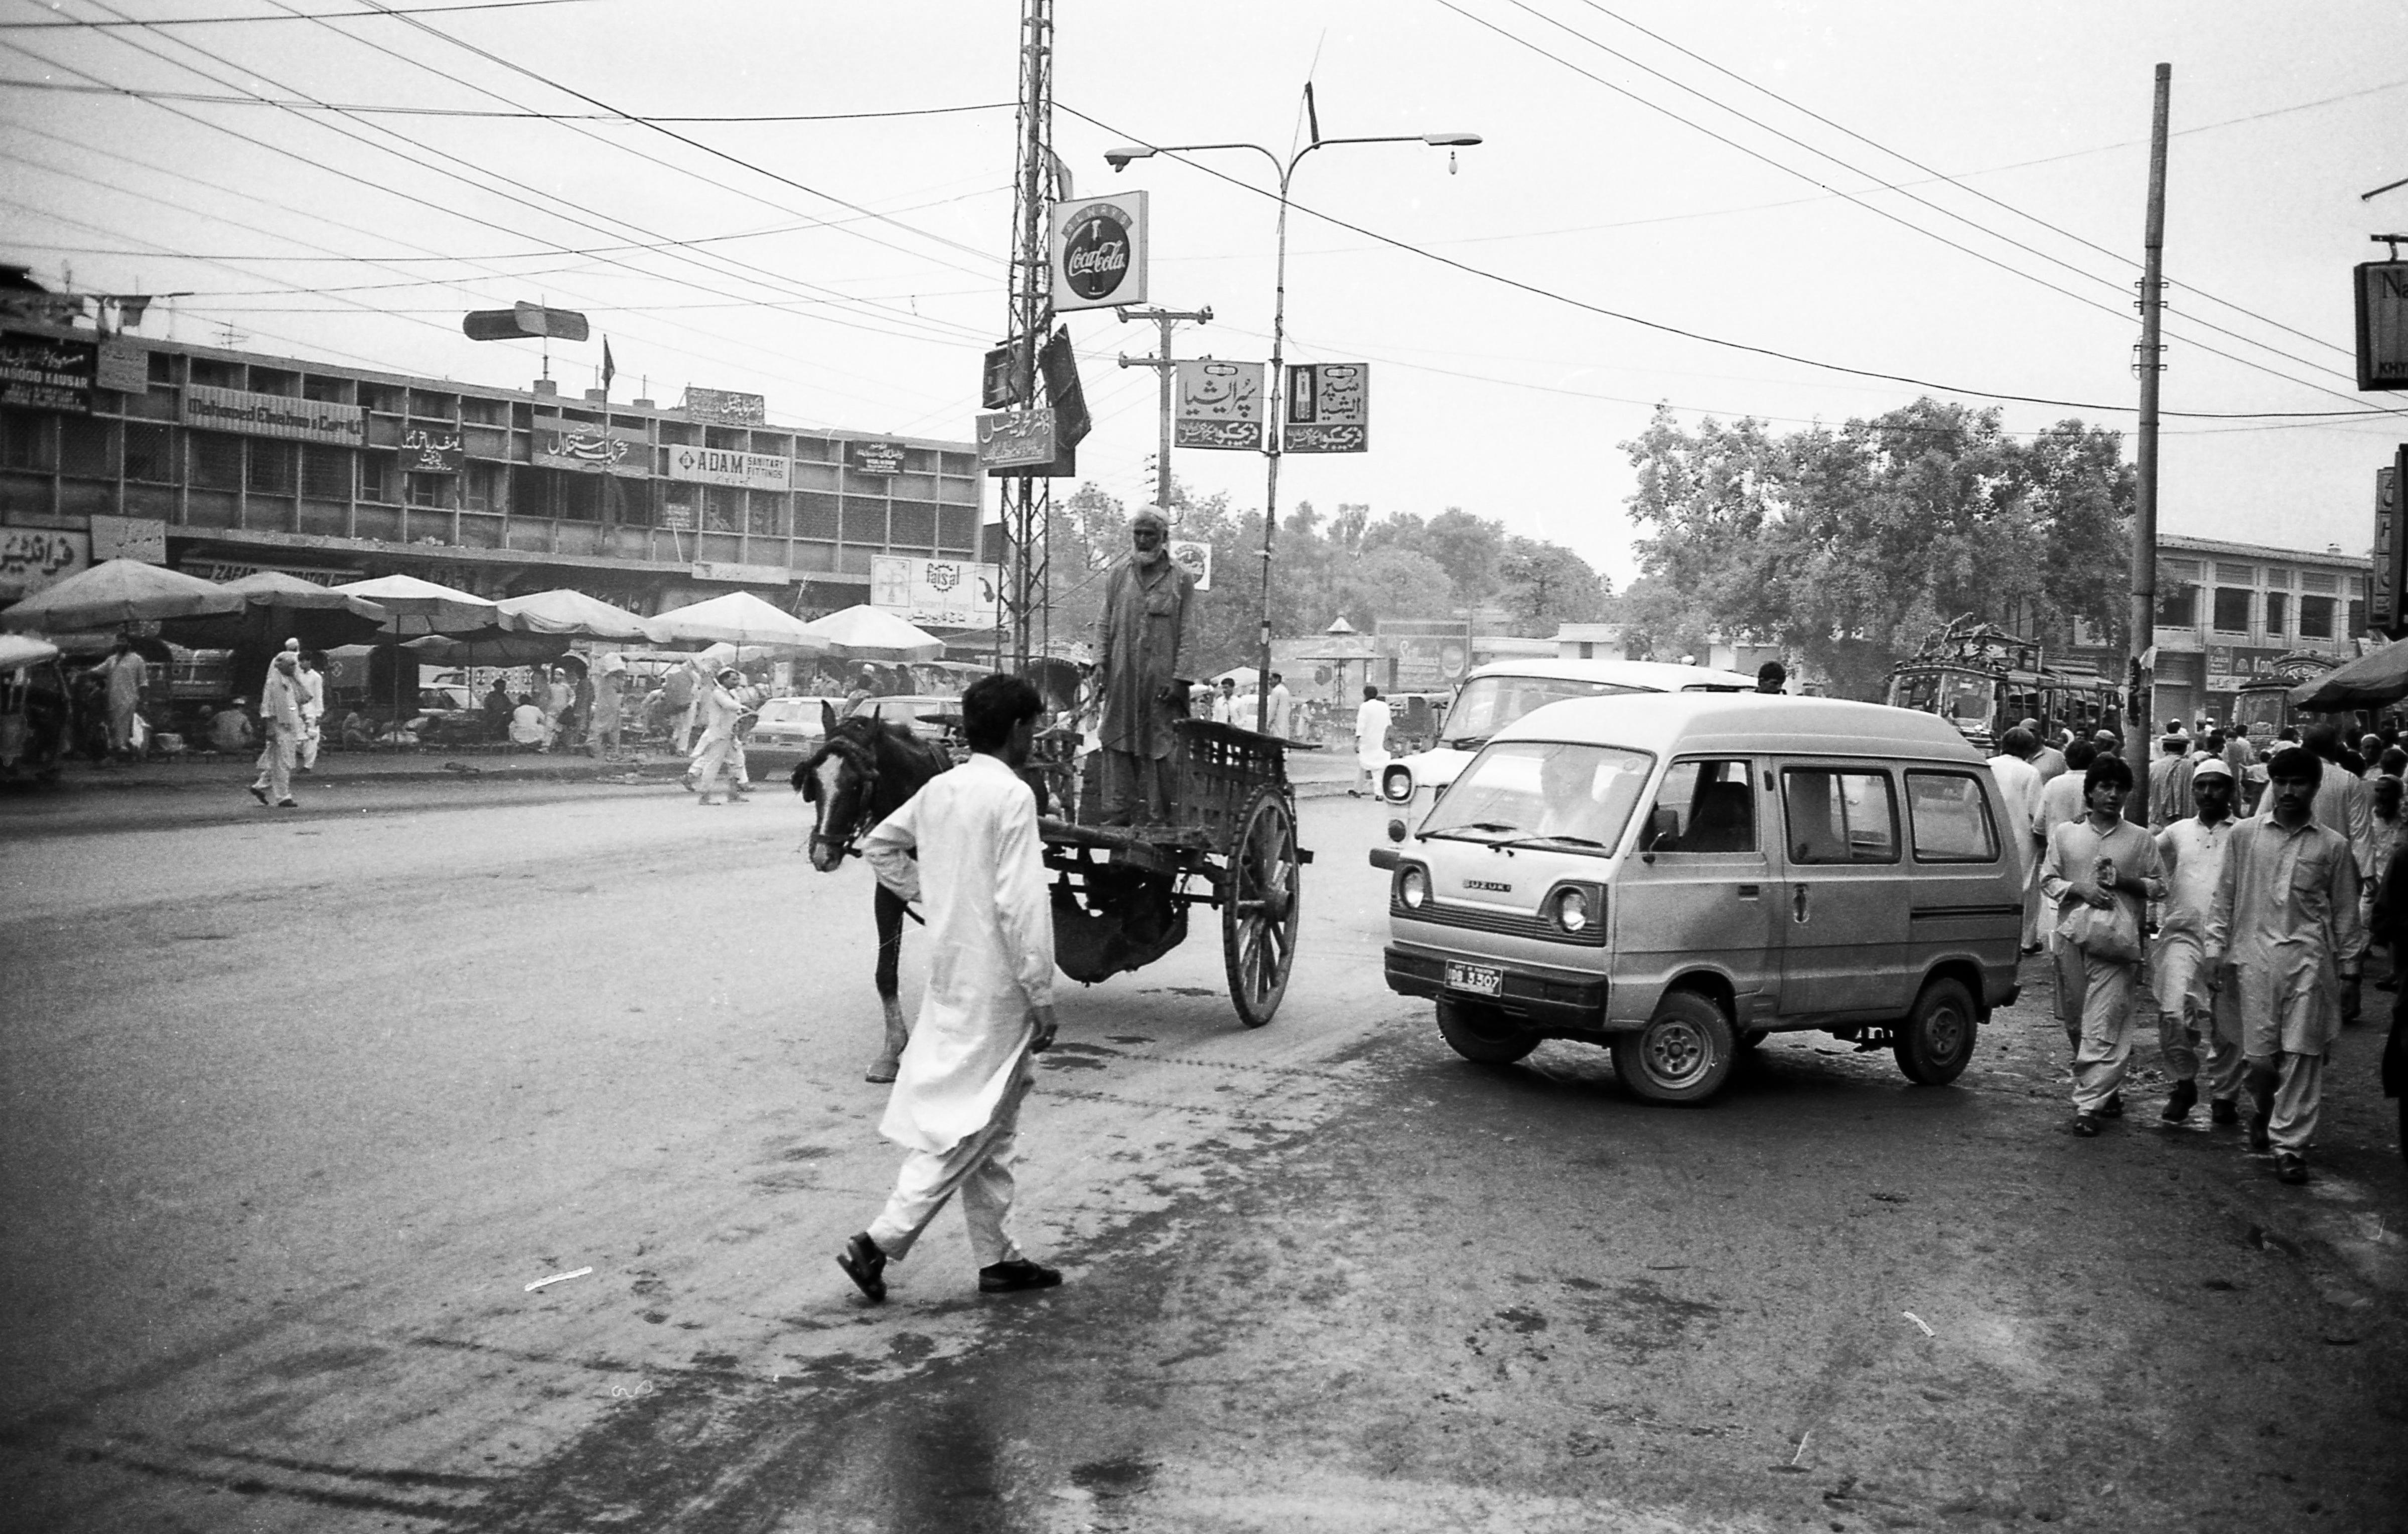 peshawar (1 of 1)